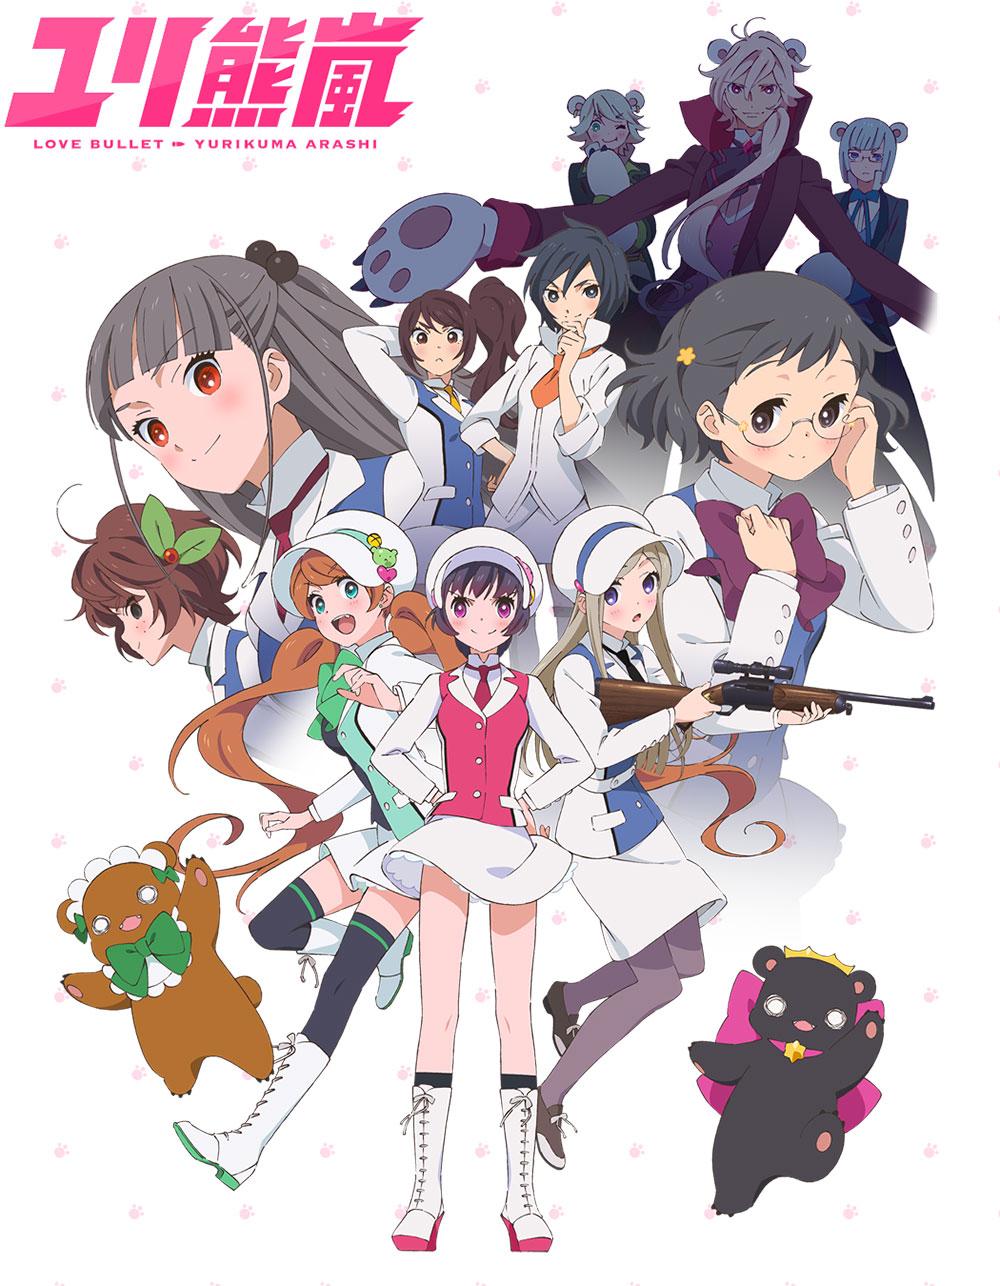 Yuri-Kuma-Arashi_Haruhichan.com-Visual-2